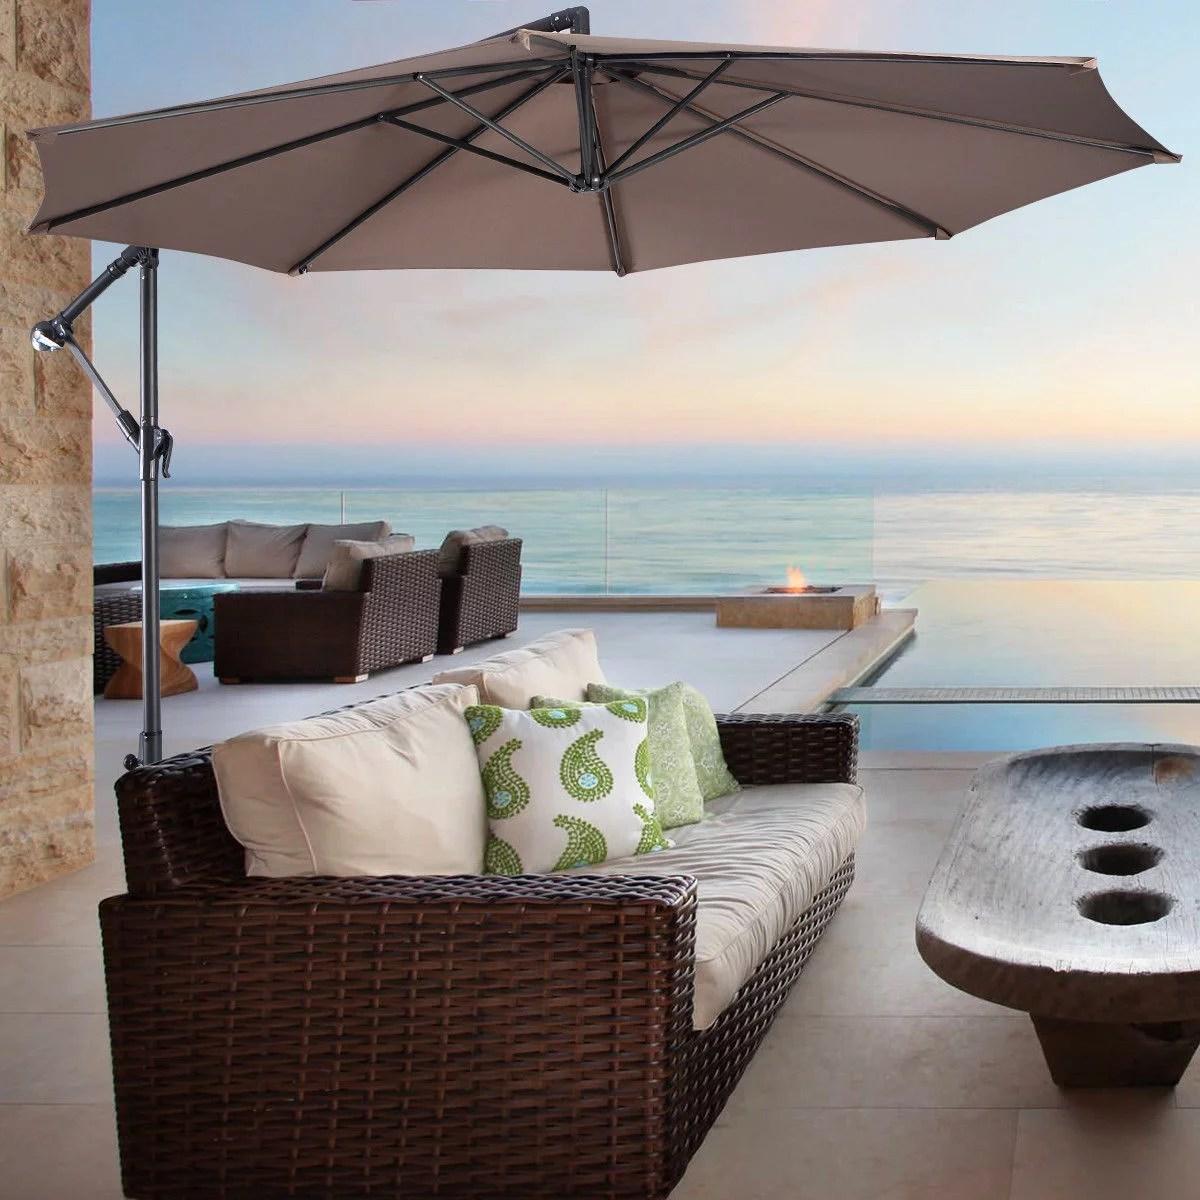 costway 10 hanging umbrella patio sun shade offset outdoor market w t cross base tan